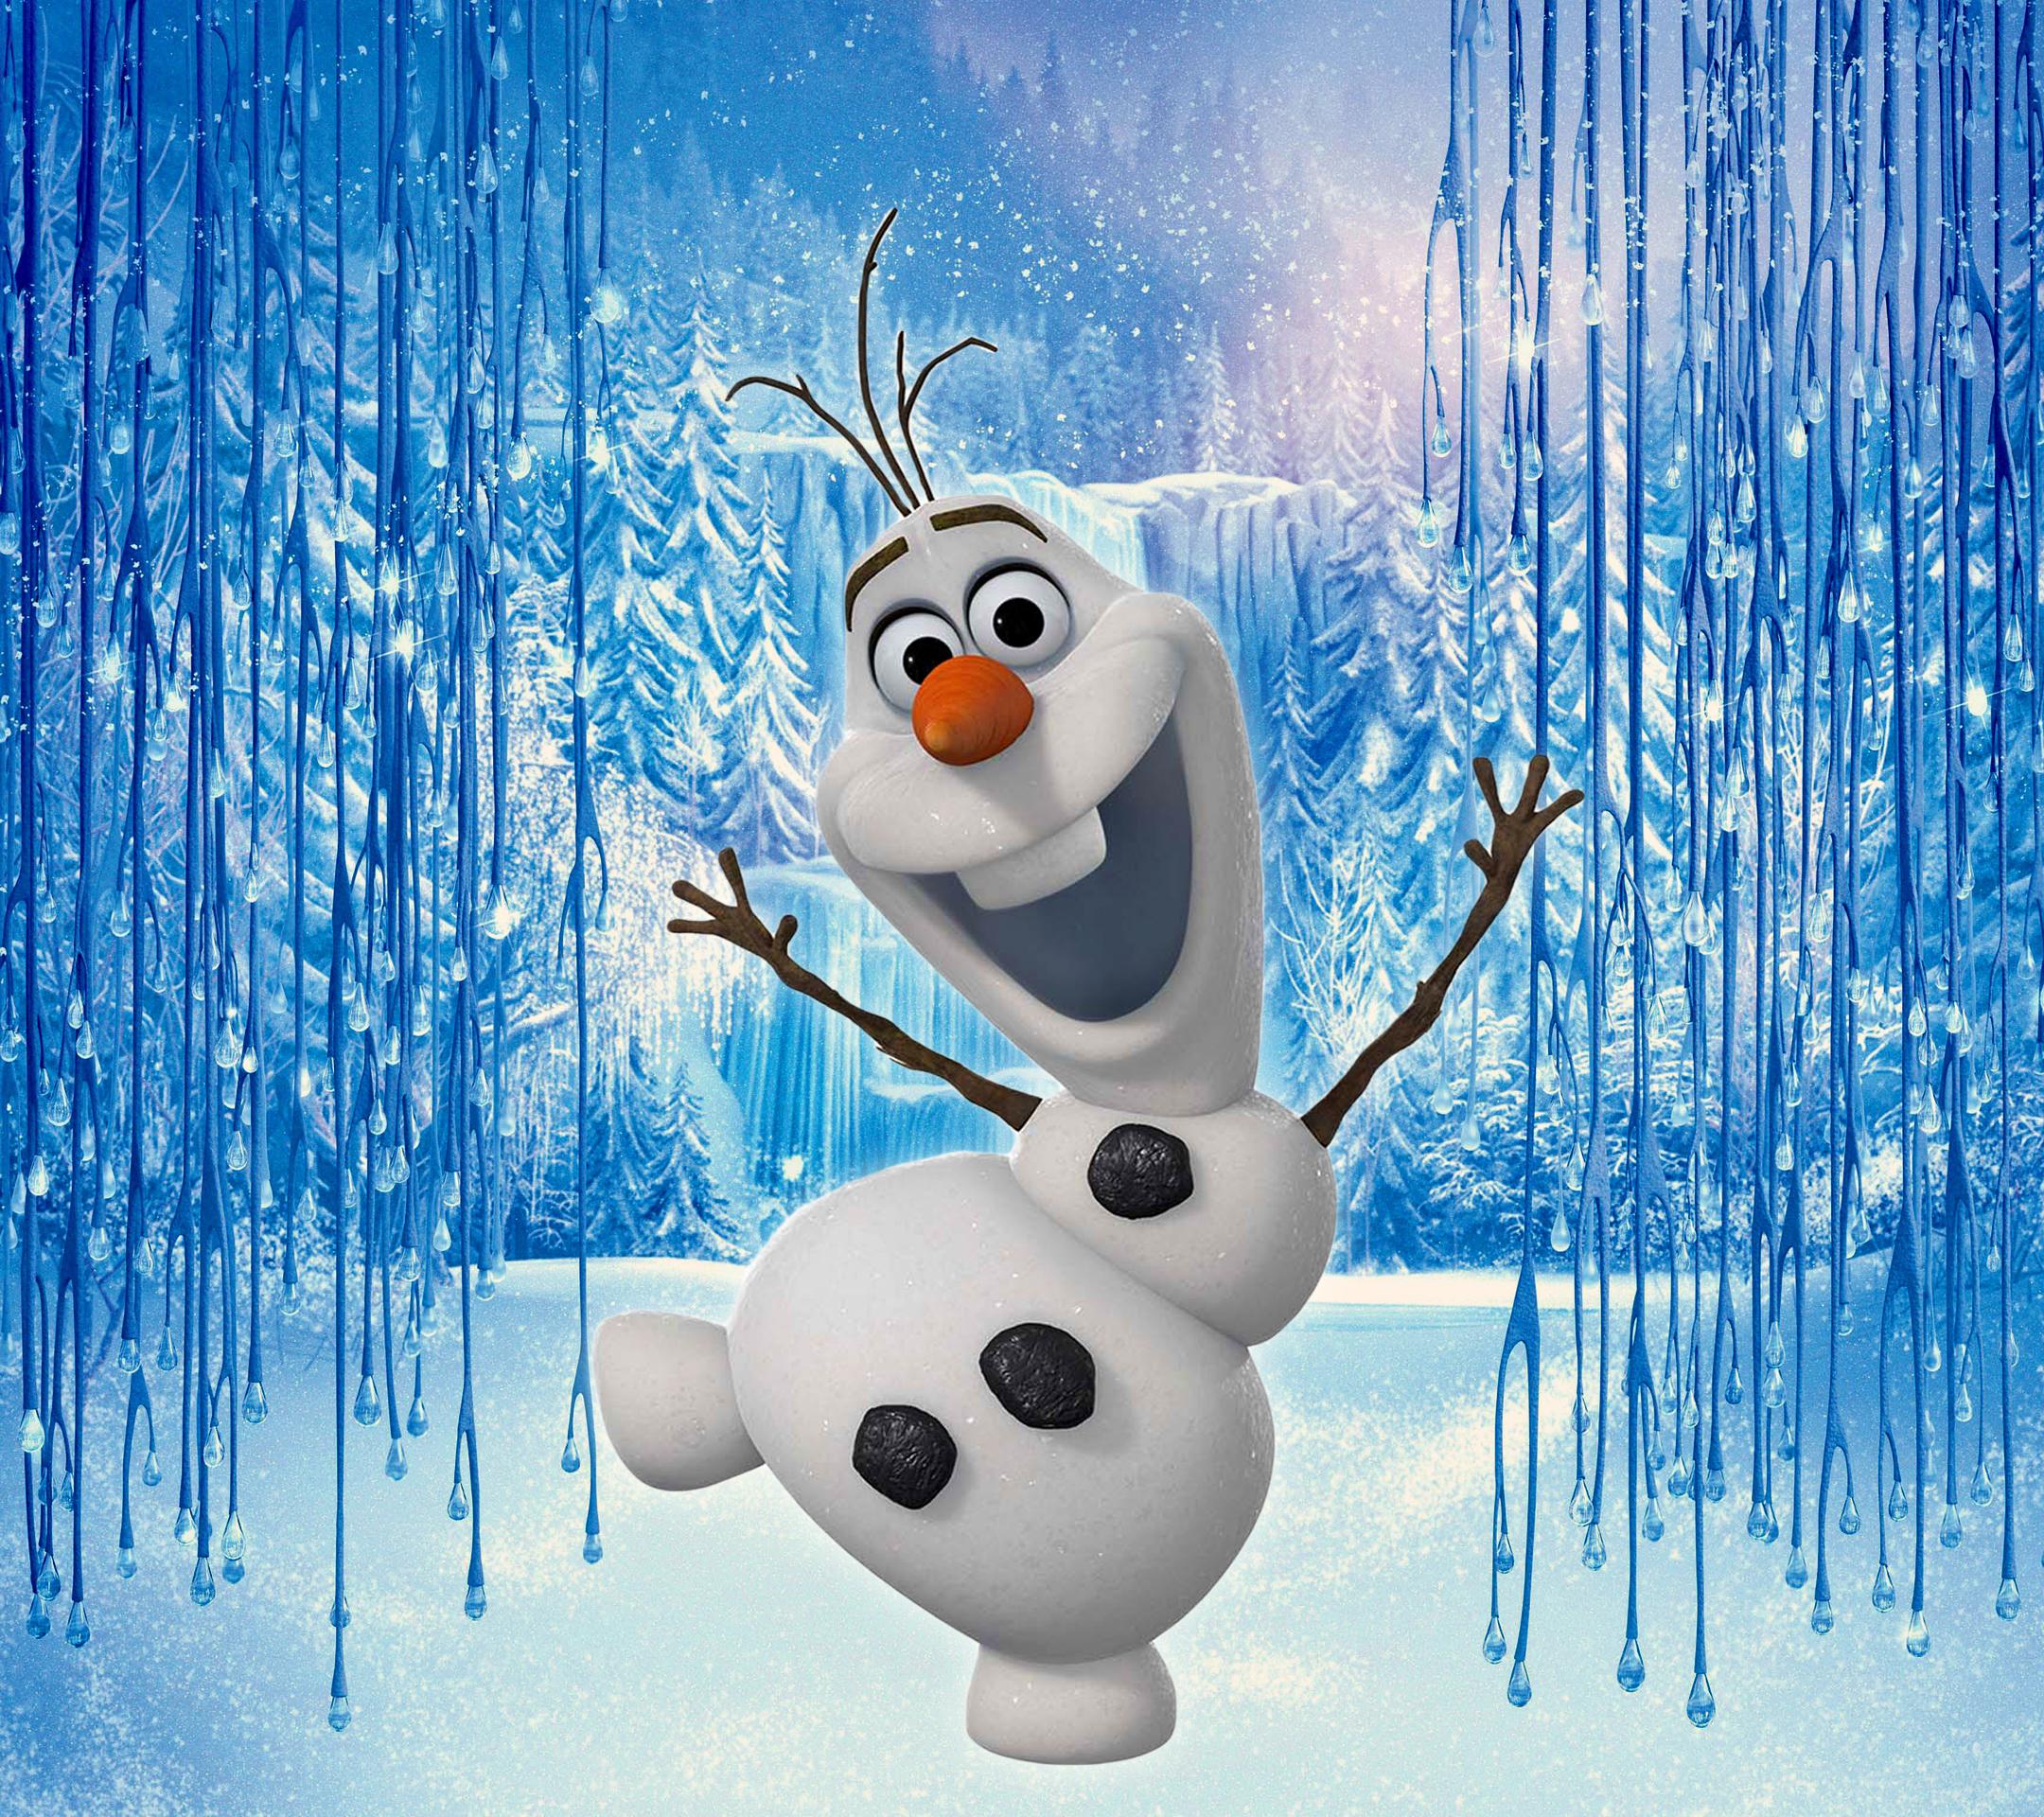 Olaf Wallpapers Frozen Wallpaper 35894665 Fanpop Pictures 2160x1920